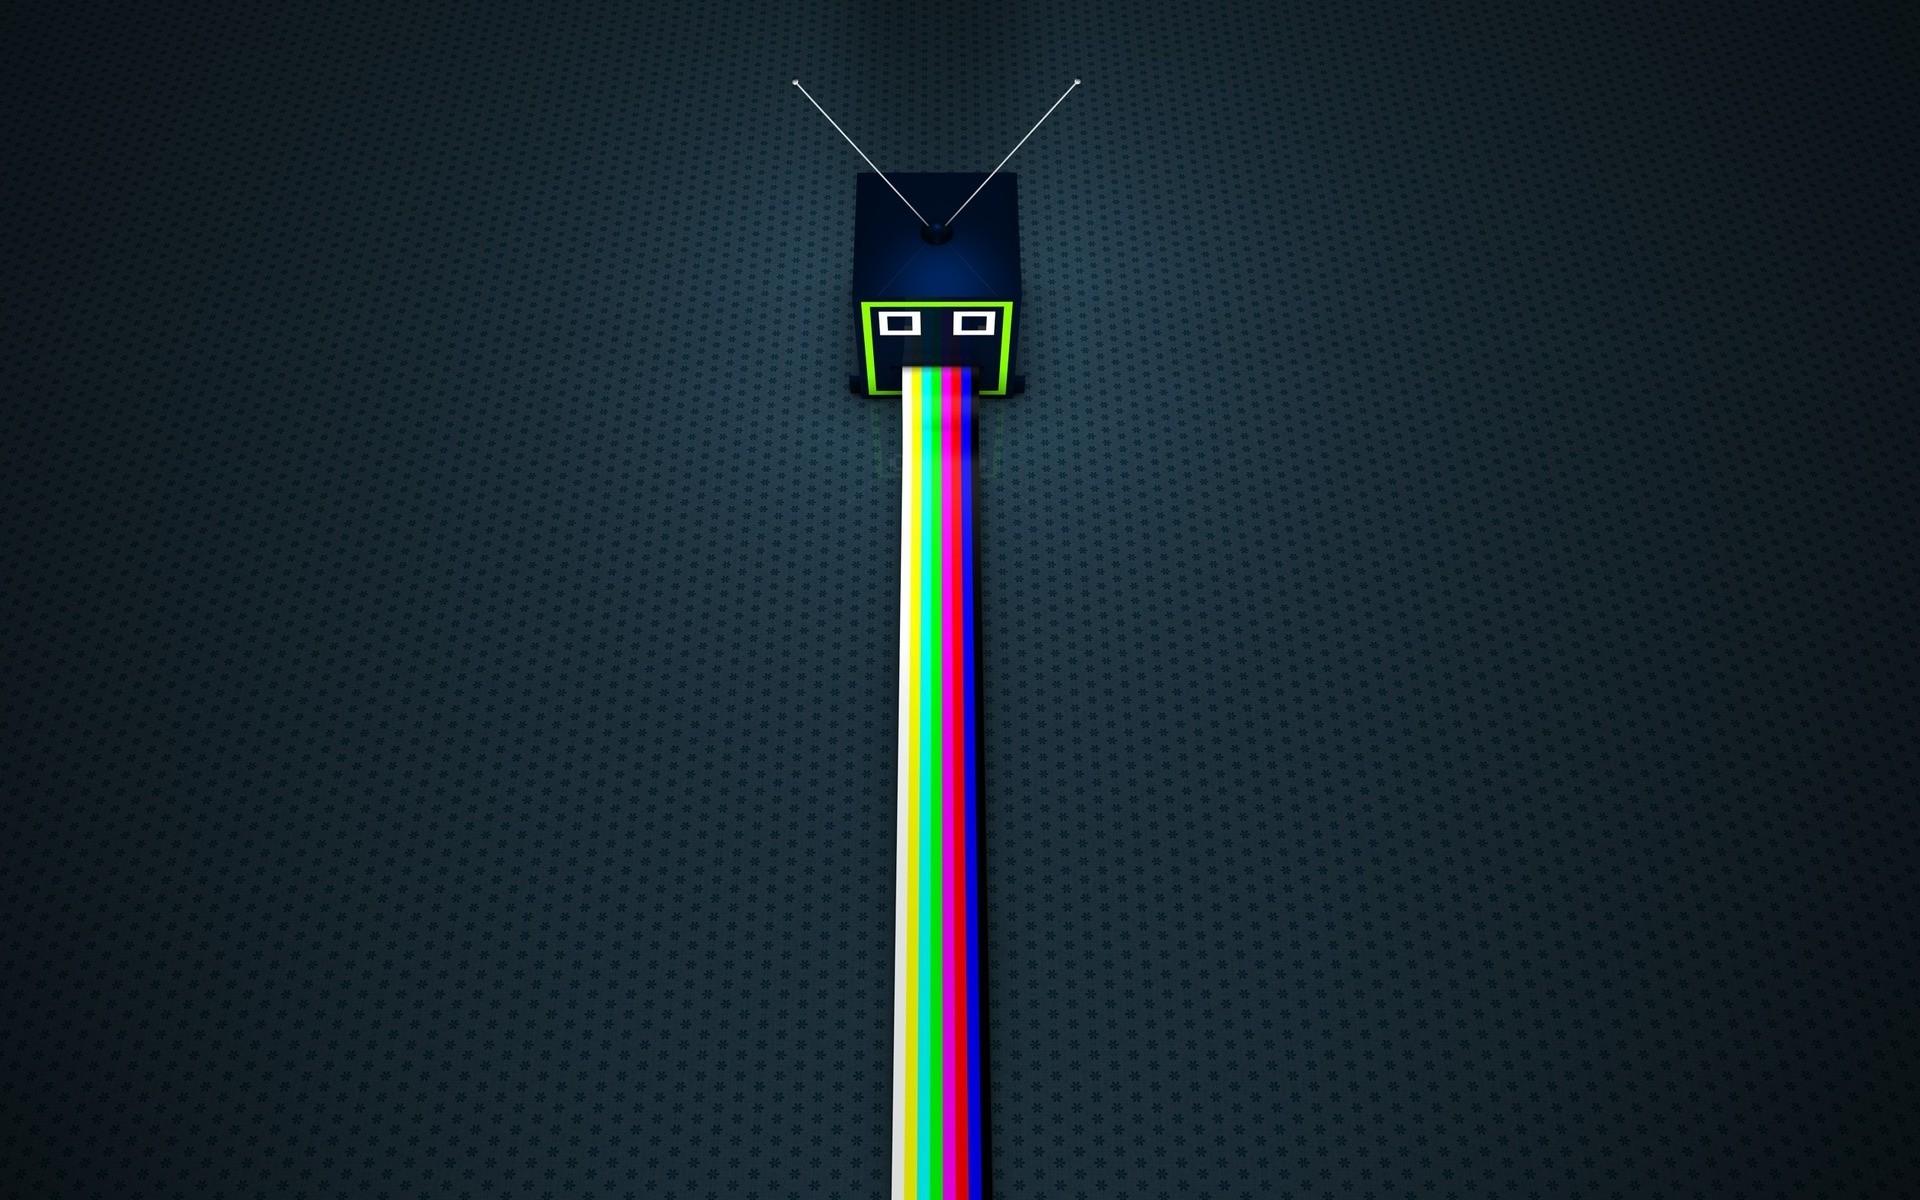 tv-puking-rainbows-funny-hd-wallpaper-1920x1200-7489